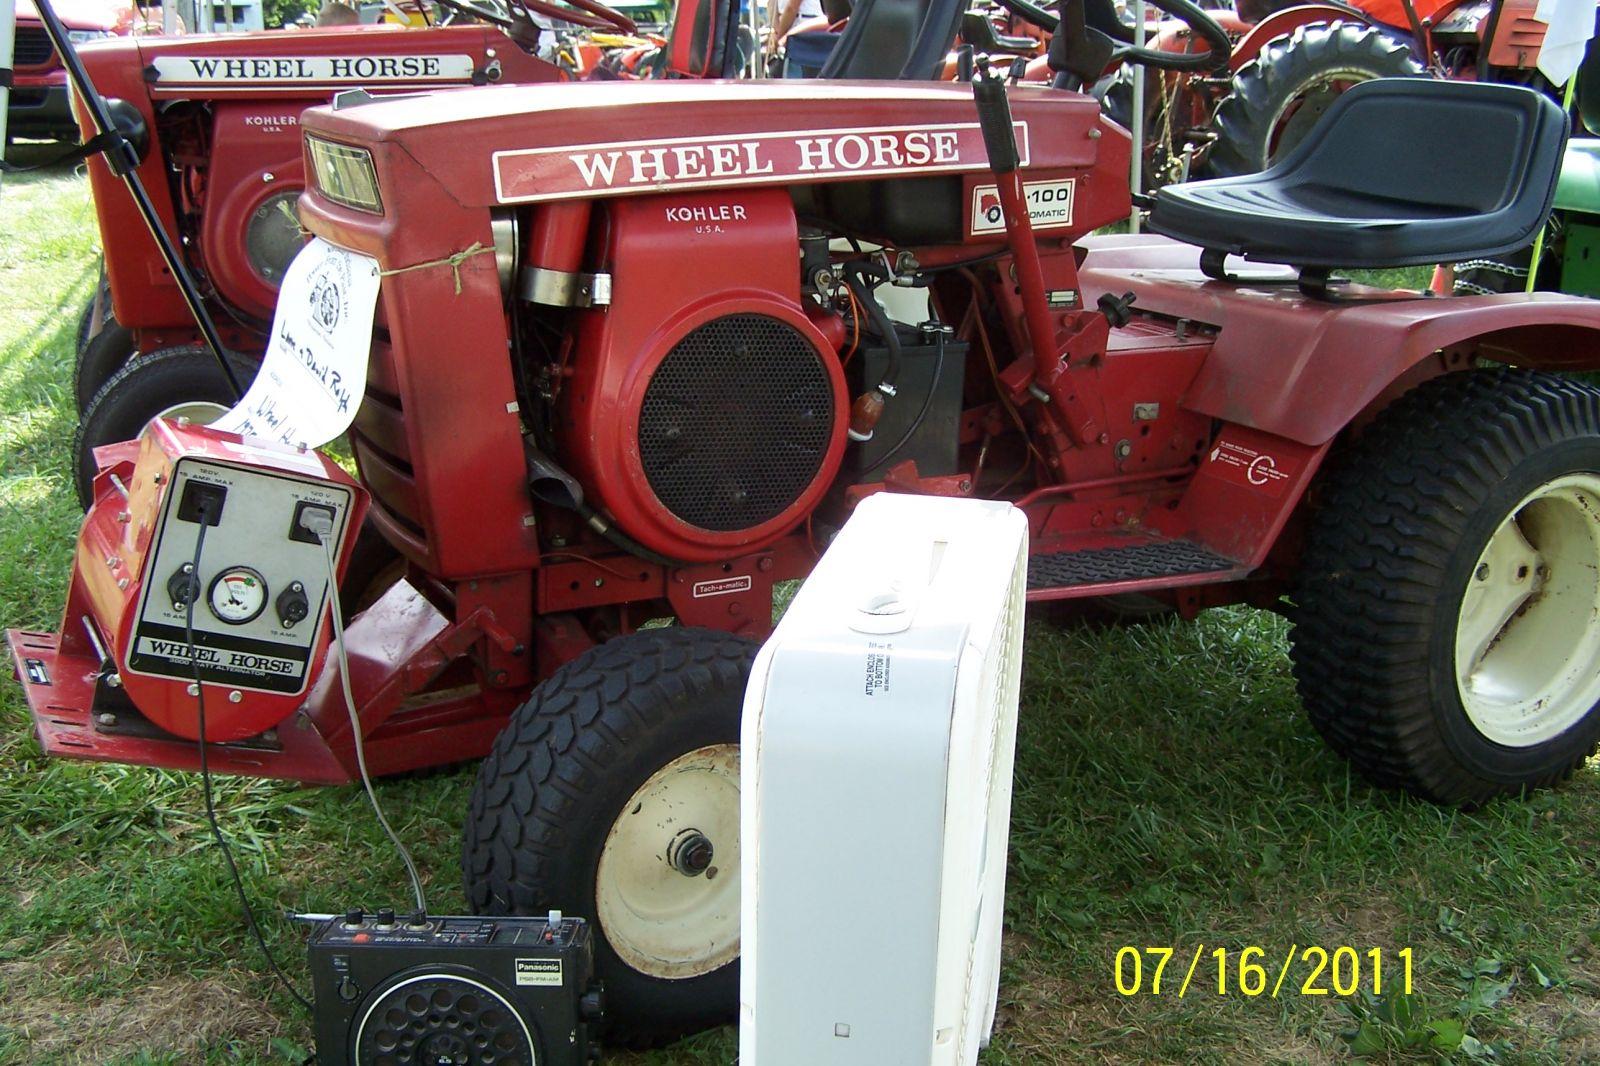 1975 B-100 and Wheel Horse 3000 Watt Generator